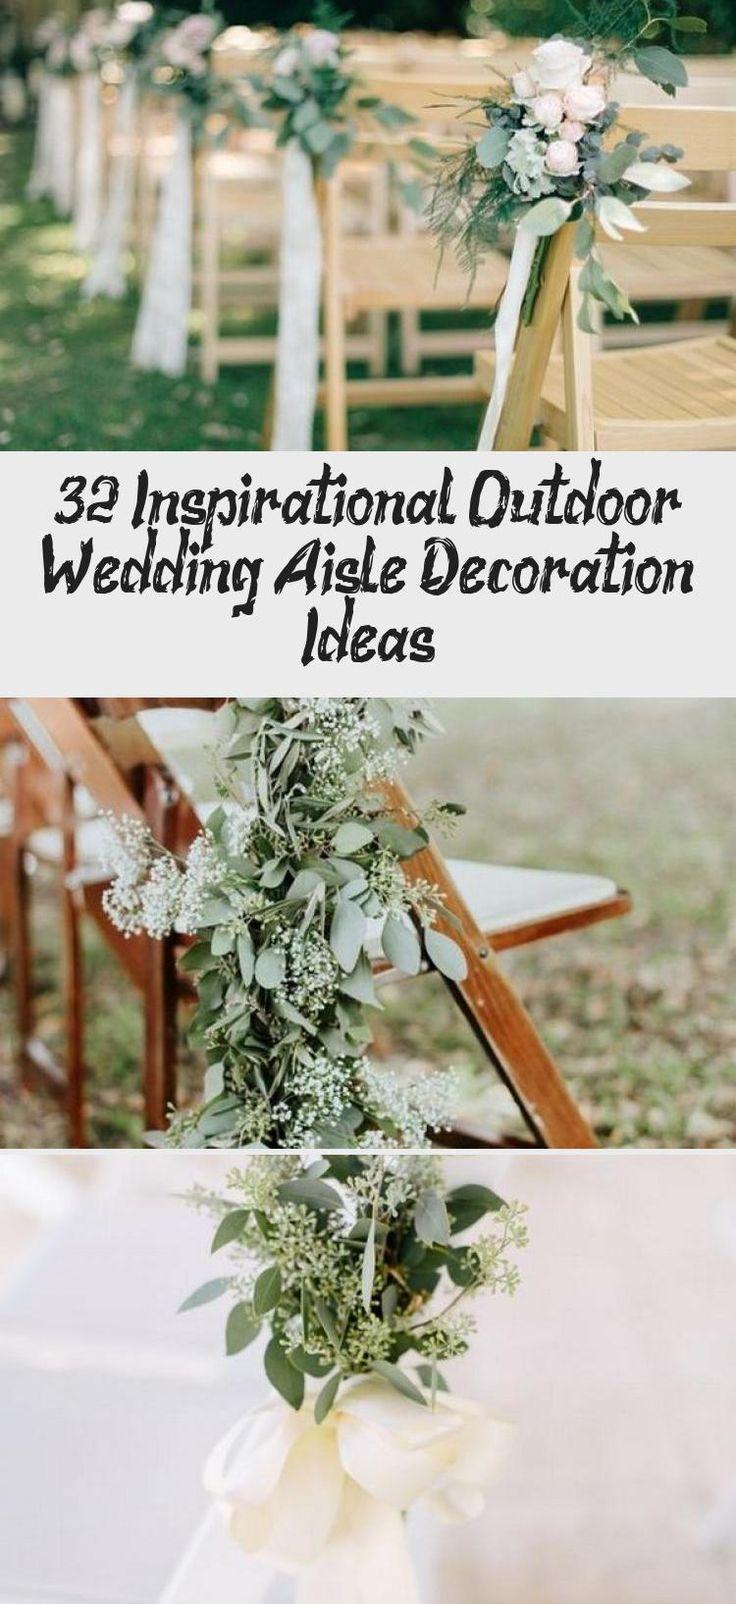 outdoor wedding aisle decoration ideas with lanterns and candles #Elegantgardenwedding #gardenweddingDeko #gardenweddingAltar #gardenweddingCenterpieces #Rusticgardenwedding